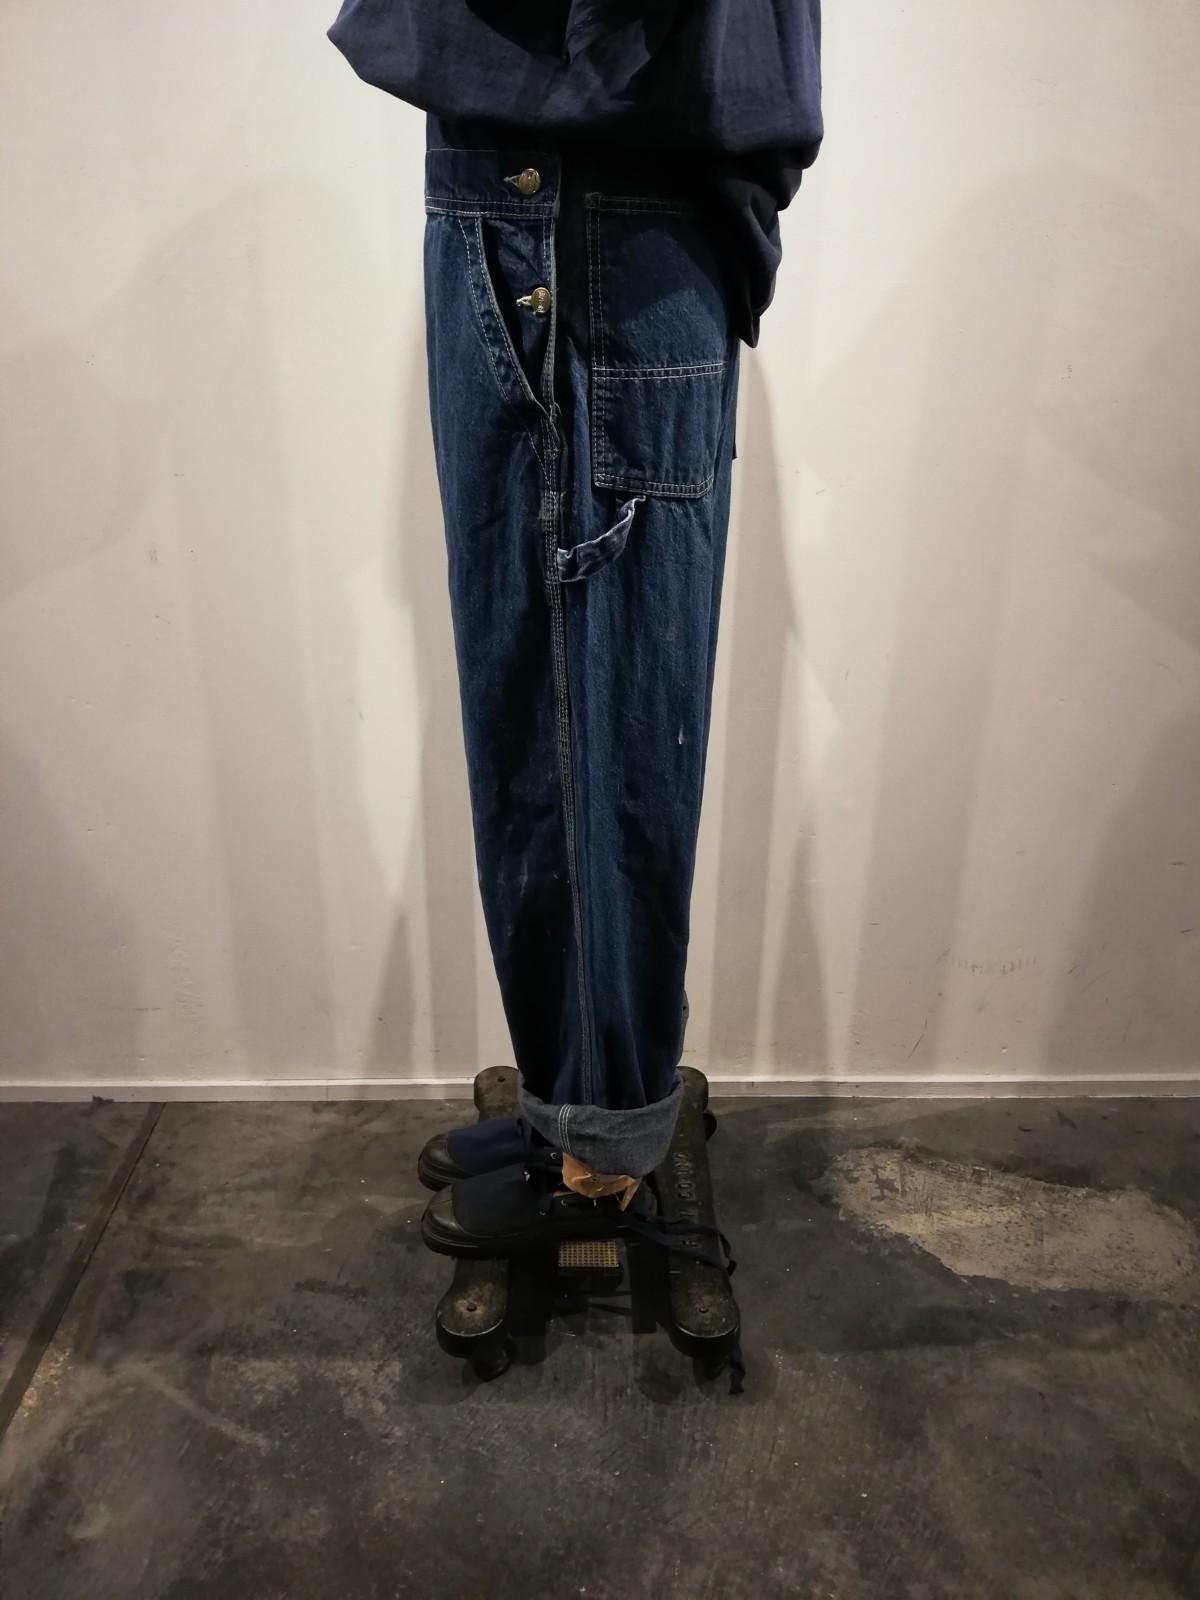 BIG SMITH, denim overalls, Dead Stock espadrilles,